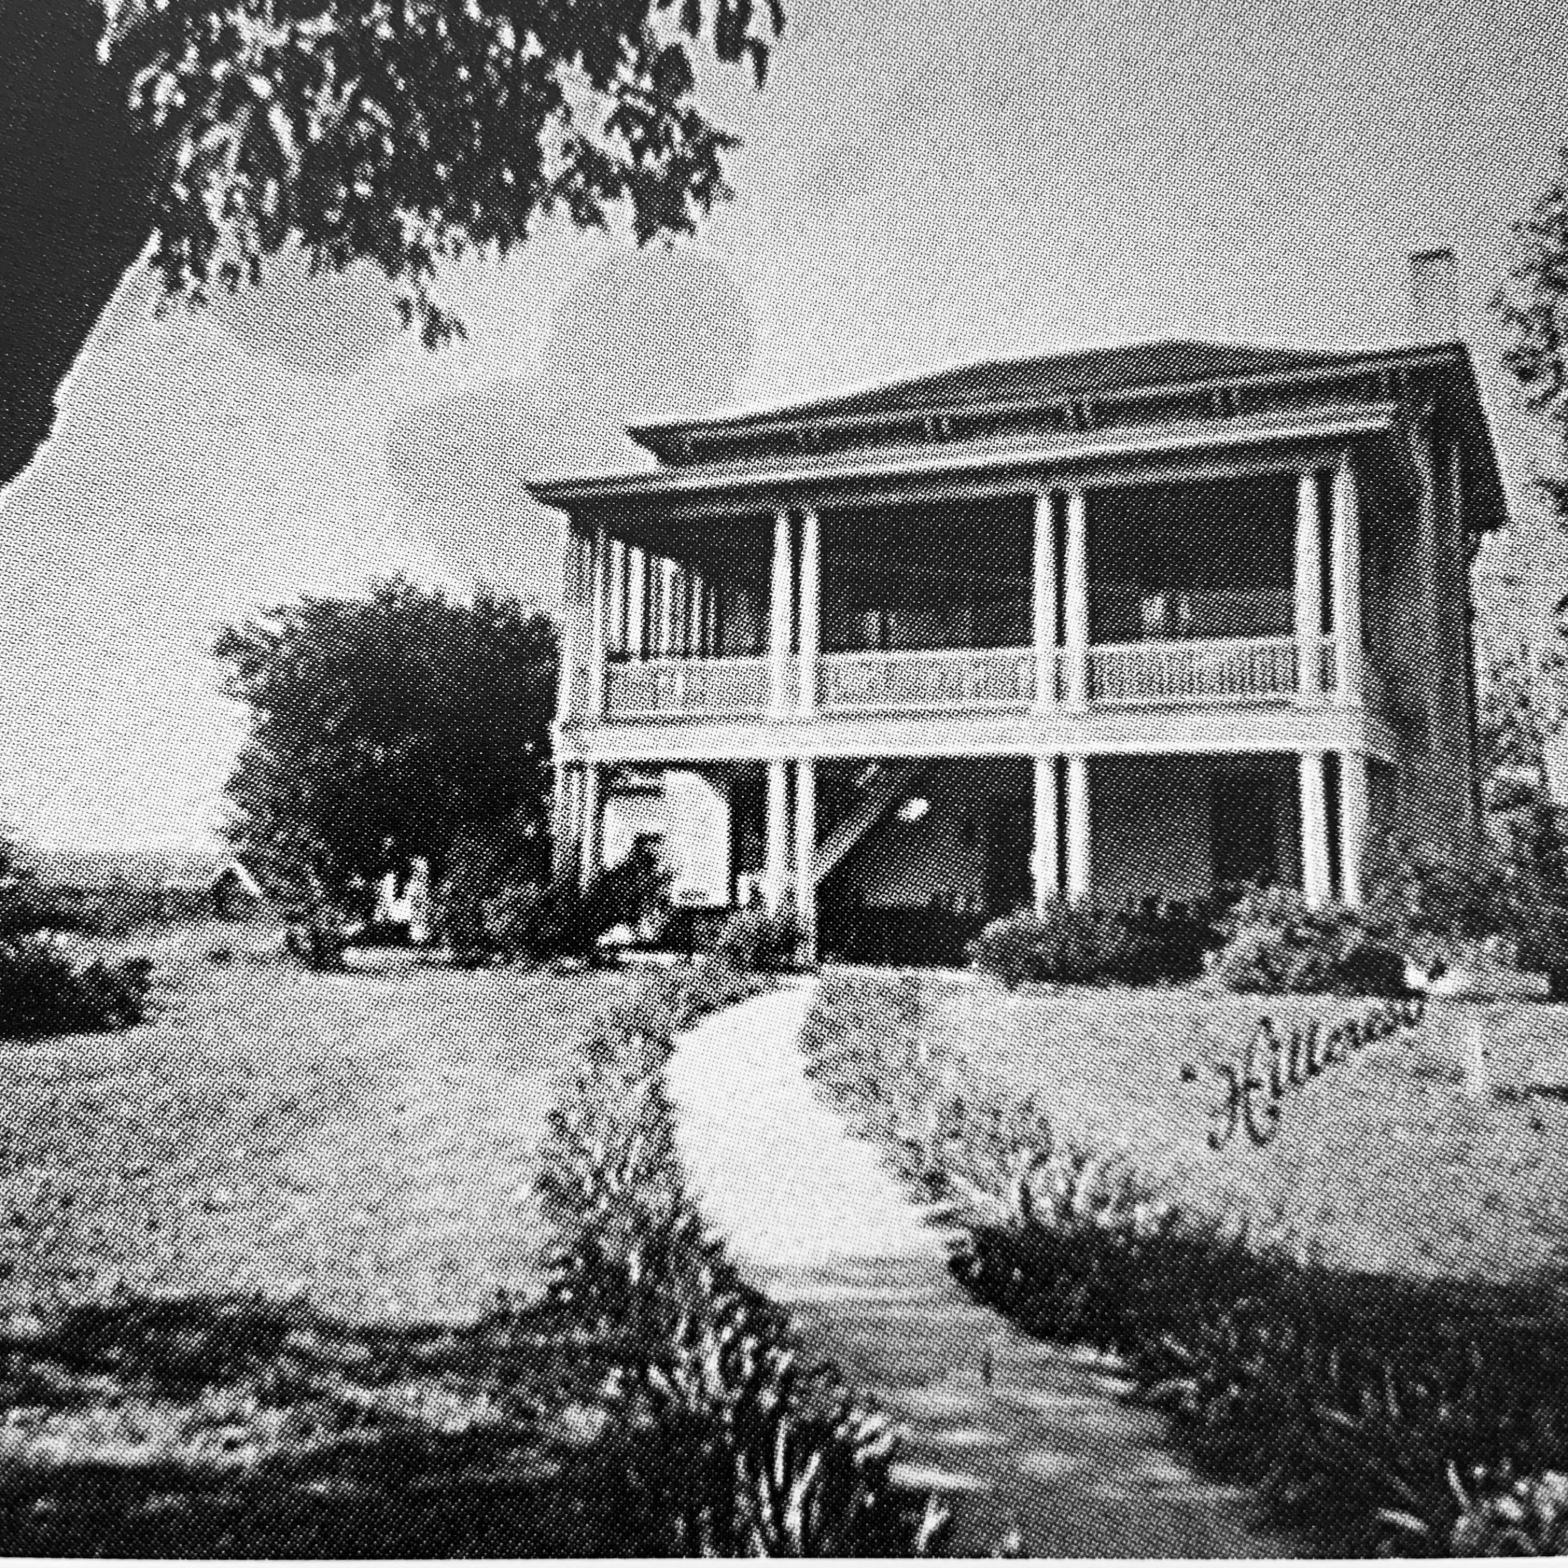 Hillcrest Mansion, 2711 Caldwell Street, North Omaha, Nebraska.